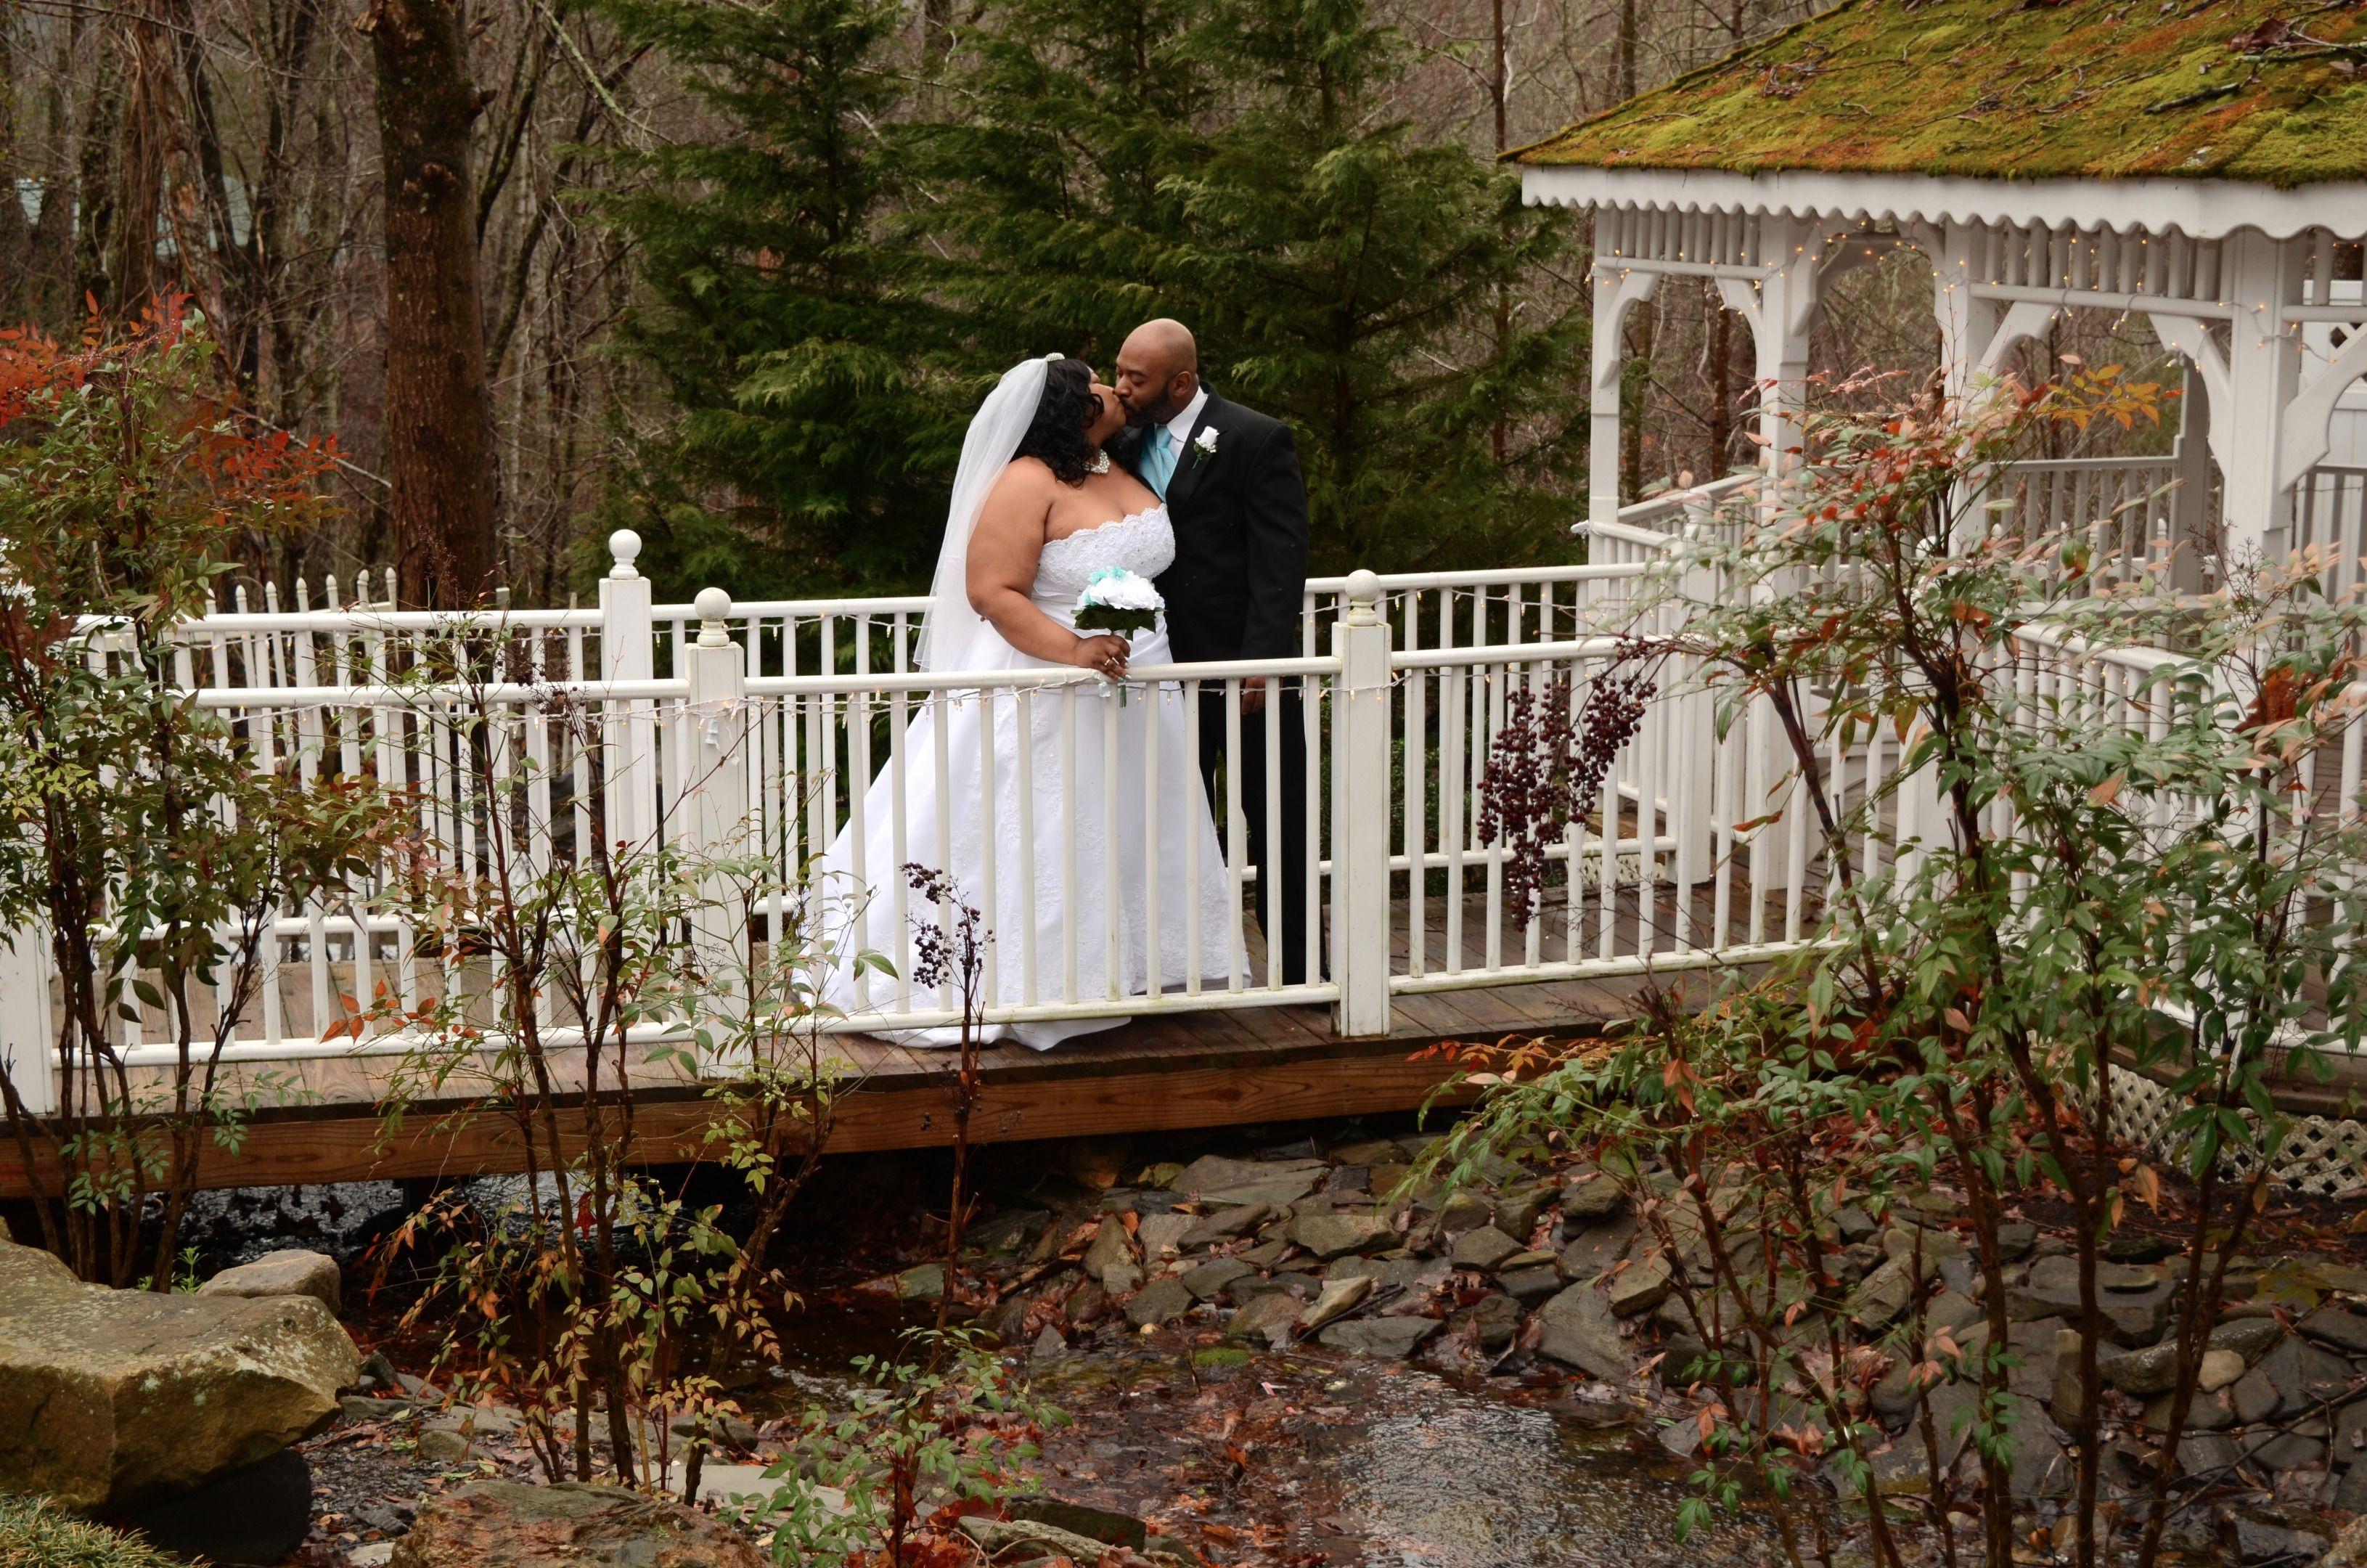 Wedding Chapel at Honeymoon Hills, Gatlinburg Wedding Chapel image 16